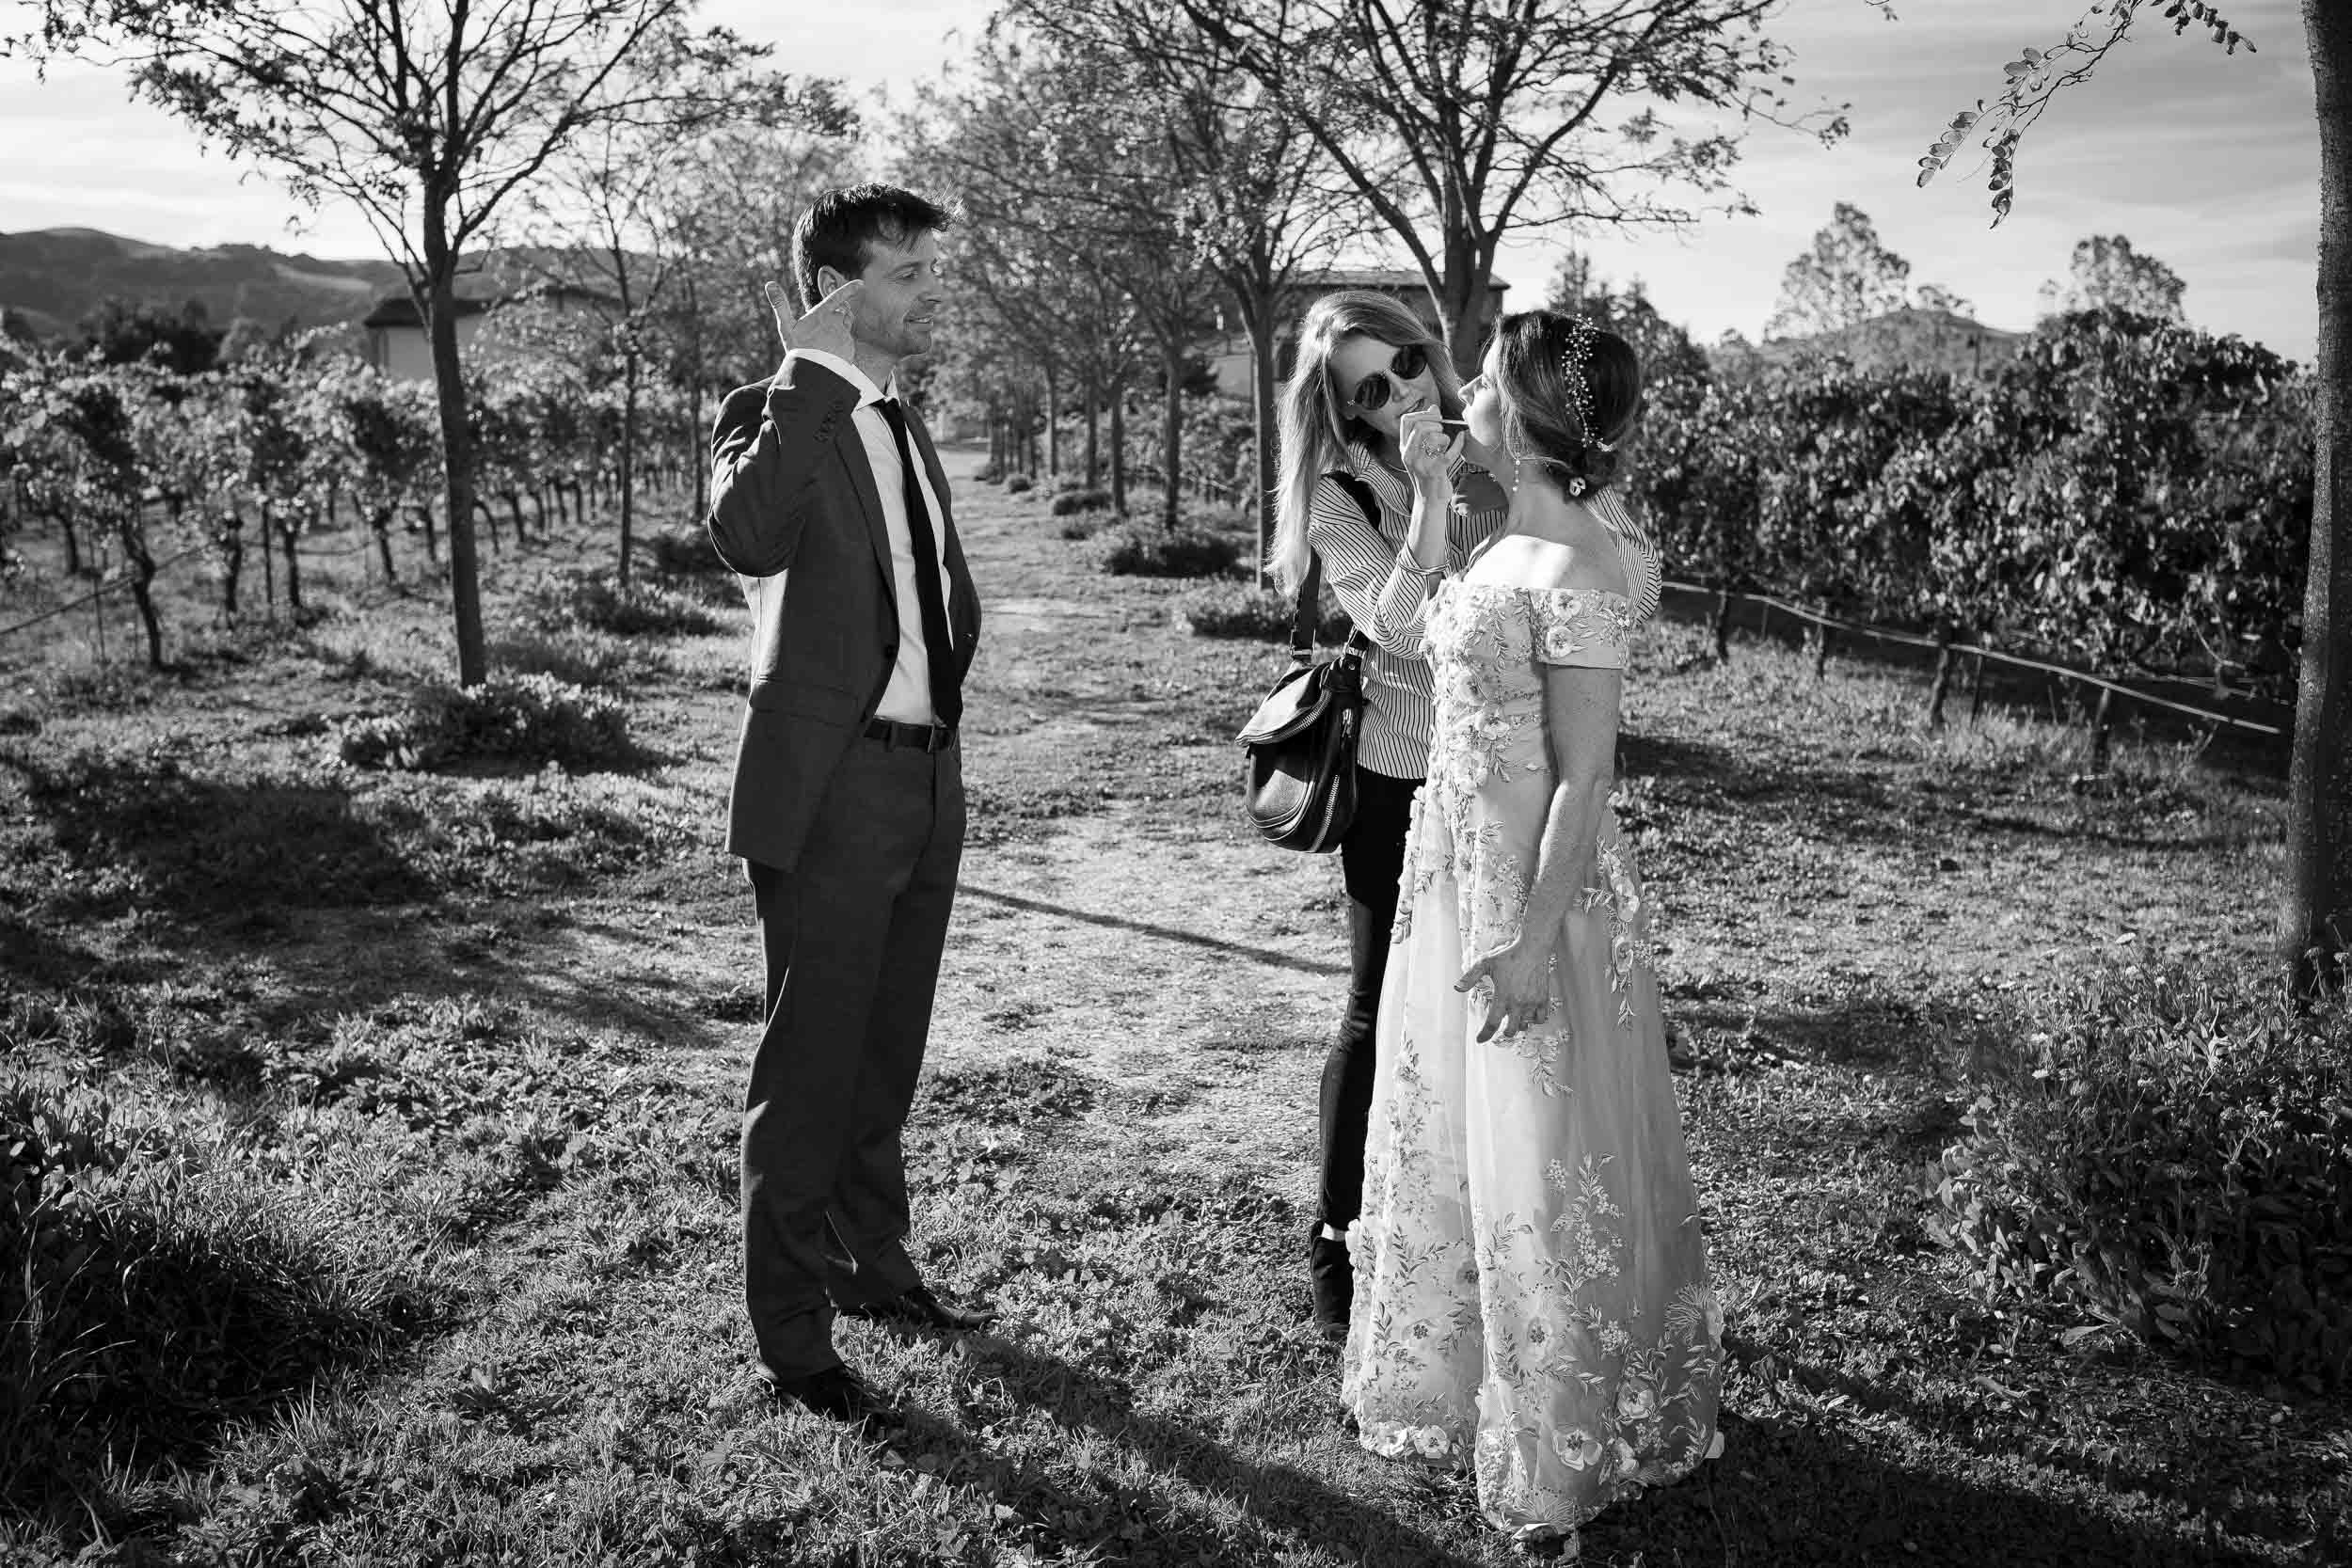 Jacuzzi Family Vineyards Wedding Photos-11.jpg